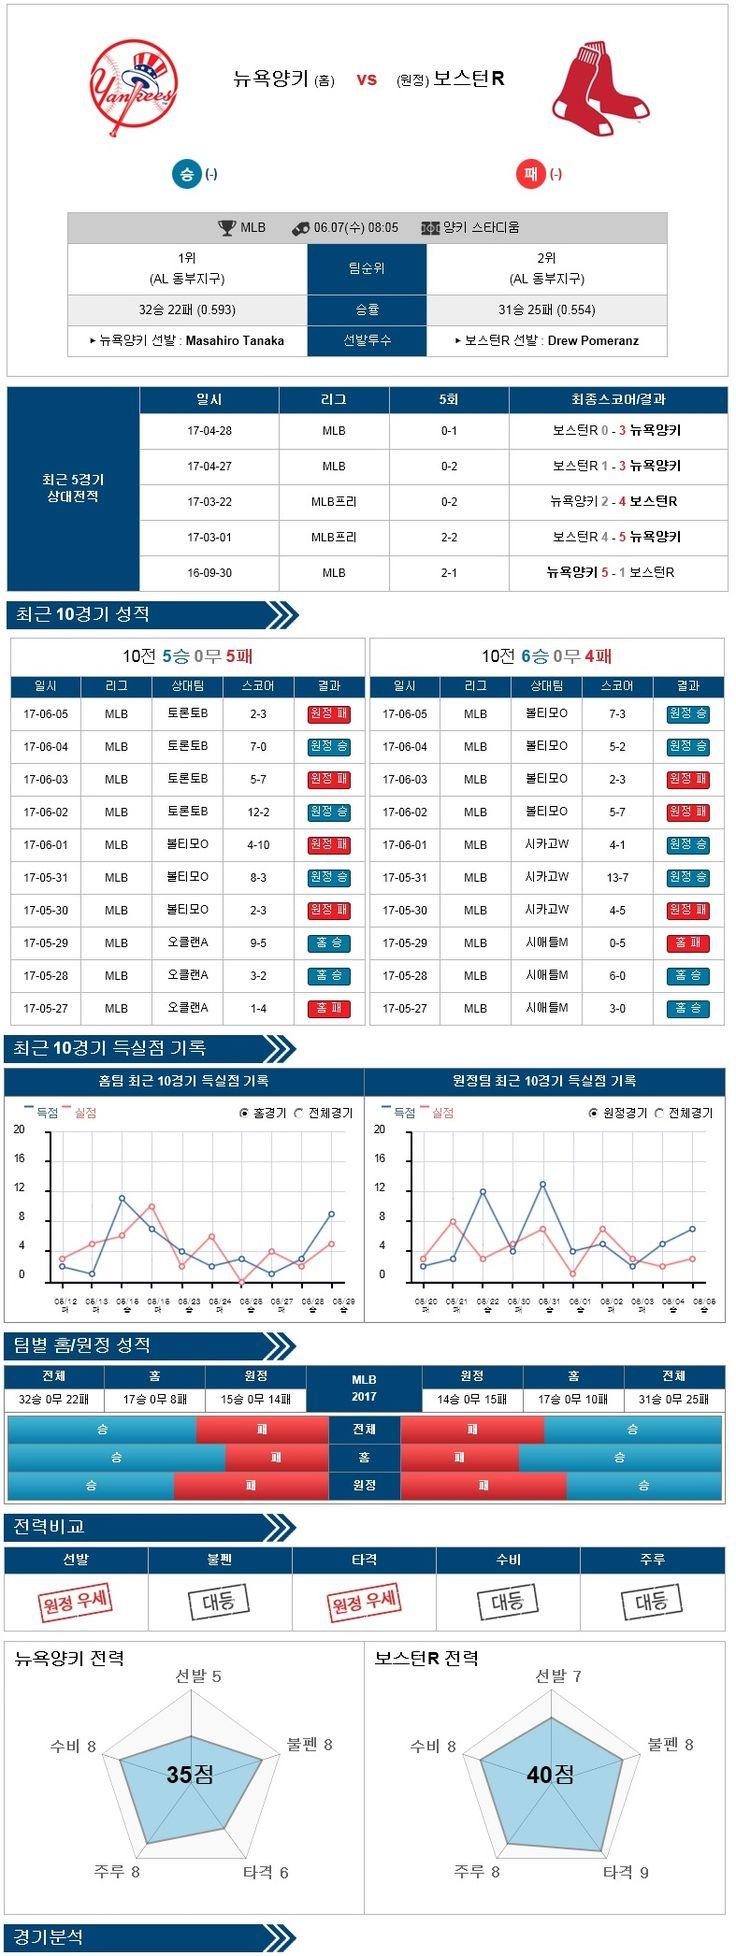 [MLB] 6월 07일 뉴욕양키스 vs 보스턴 ★토토군 분석★